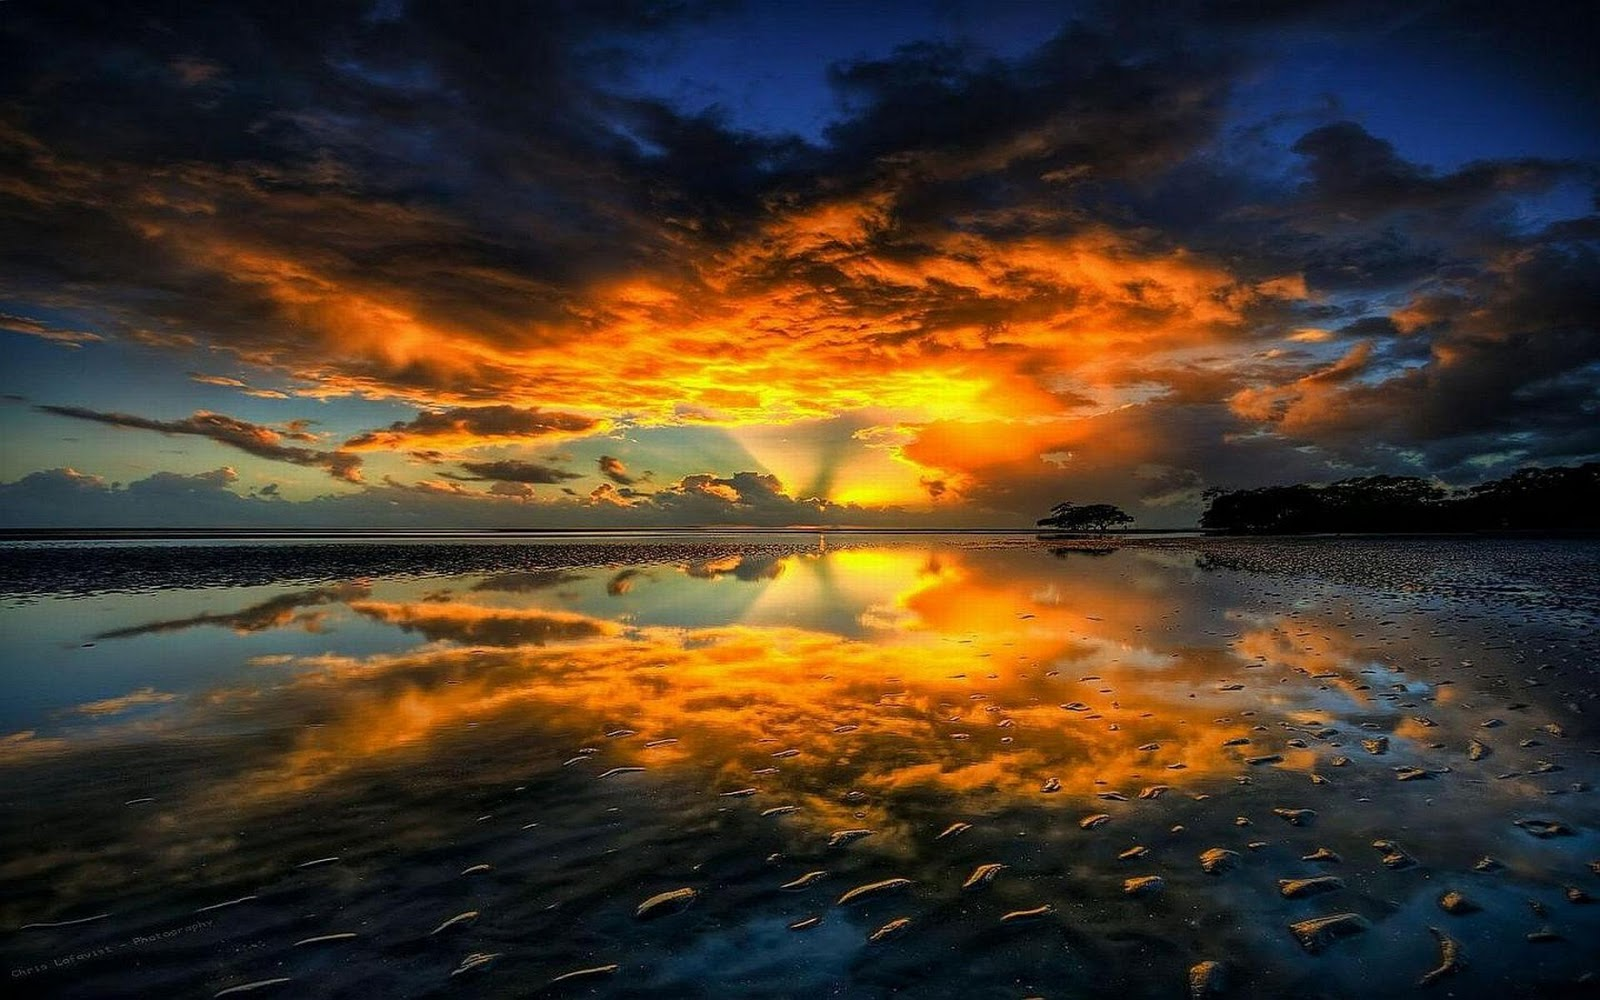 Sunset on the River Hd Desktop Wallpaper 1600x1000